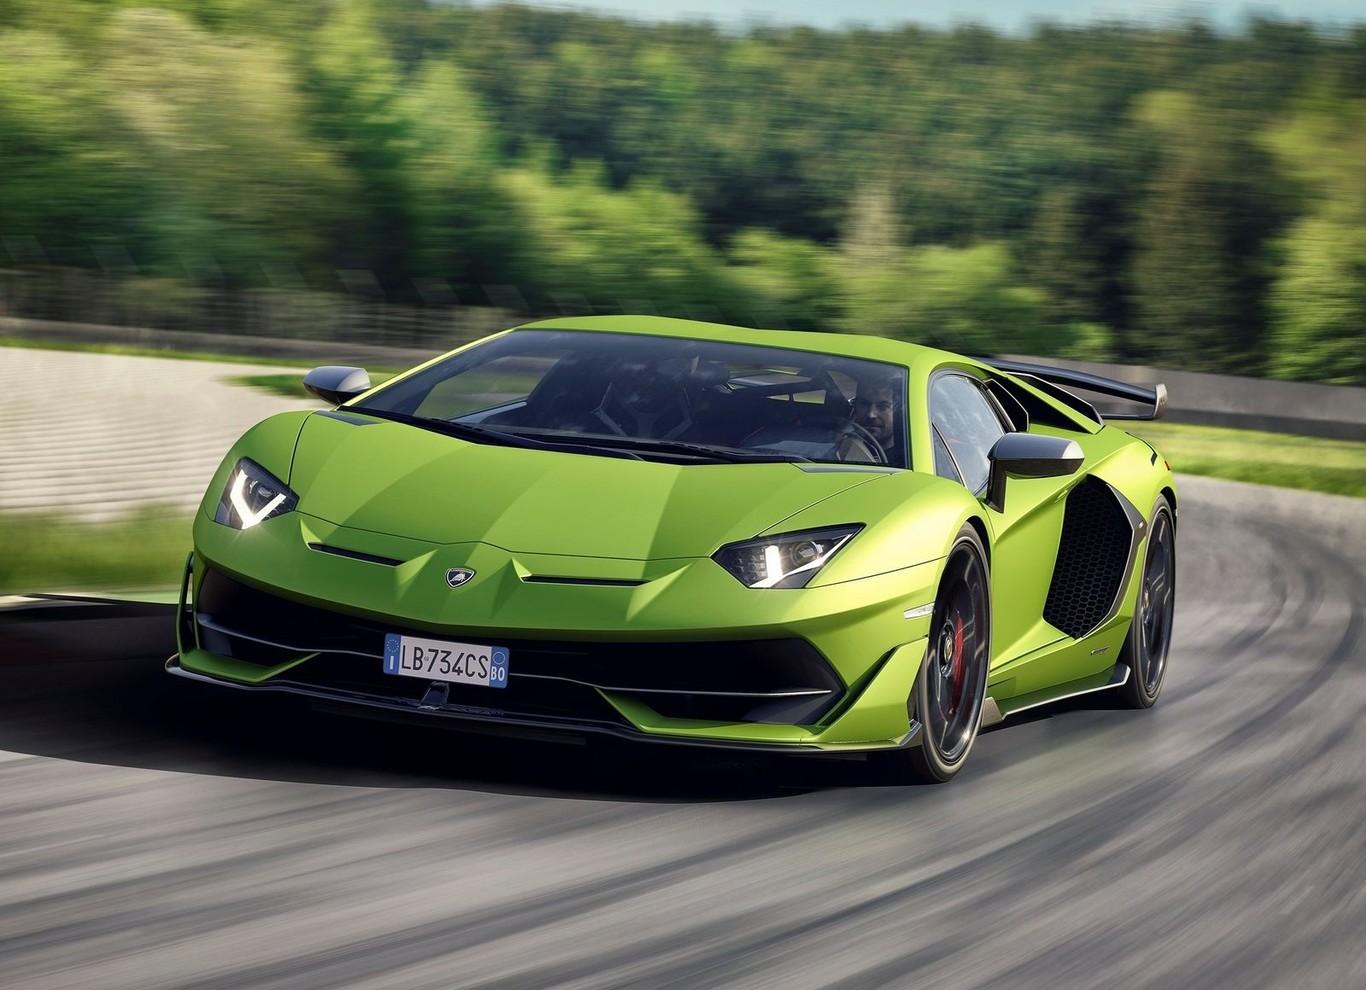 Lamborghini Aventador Svj Toda La Informacion Datos E Imagenes